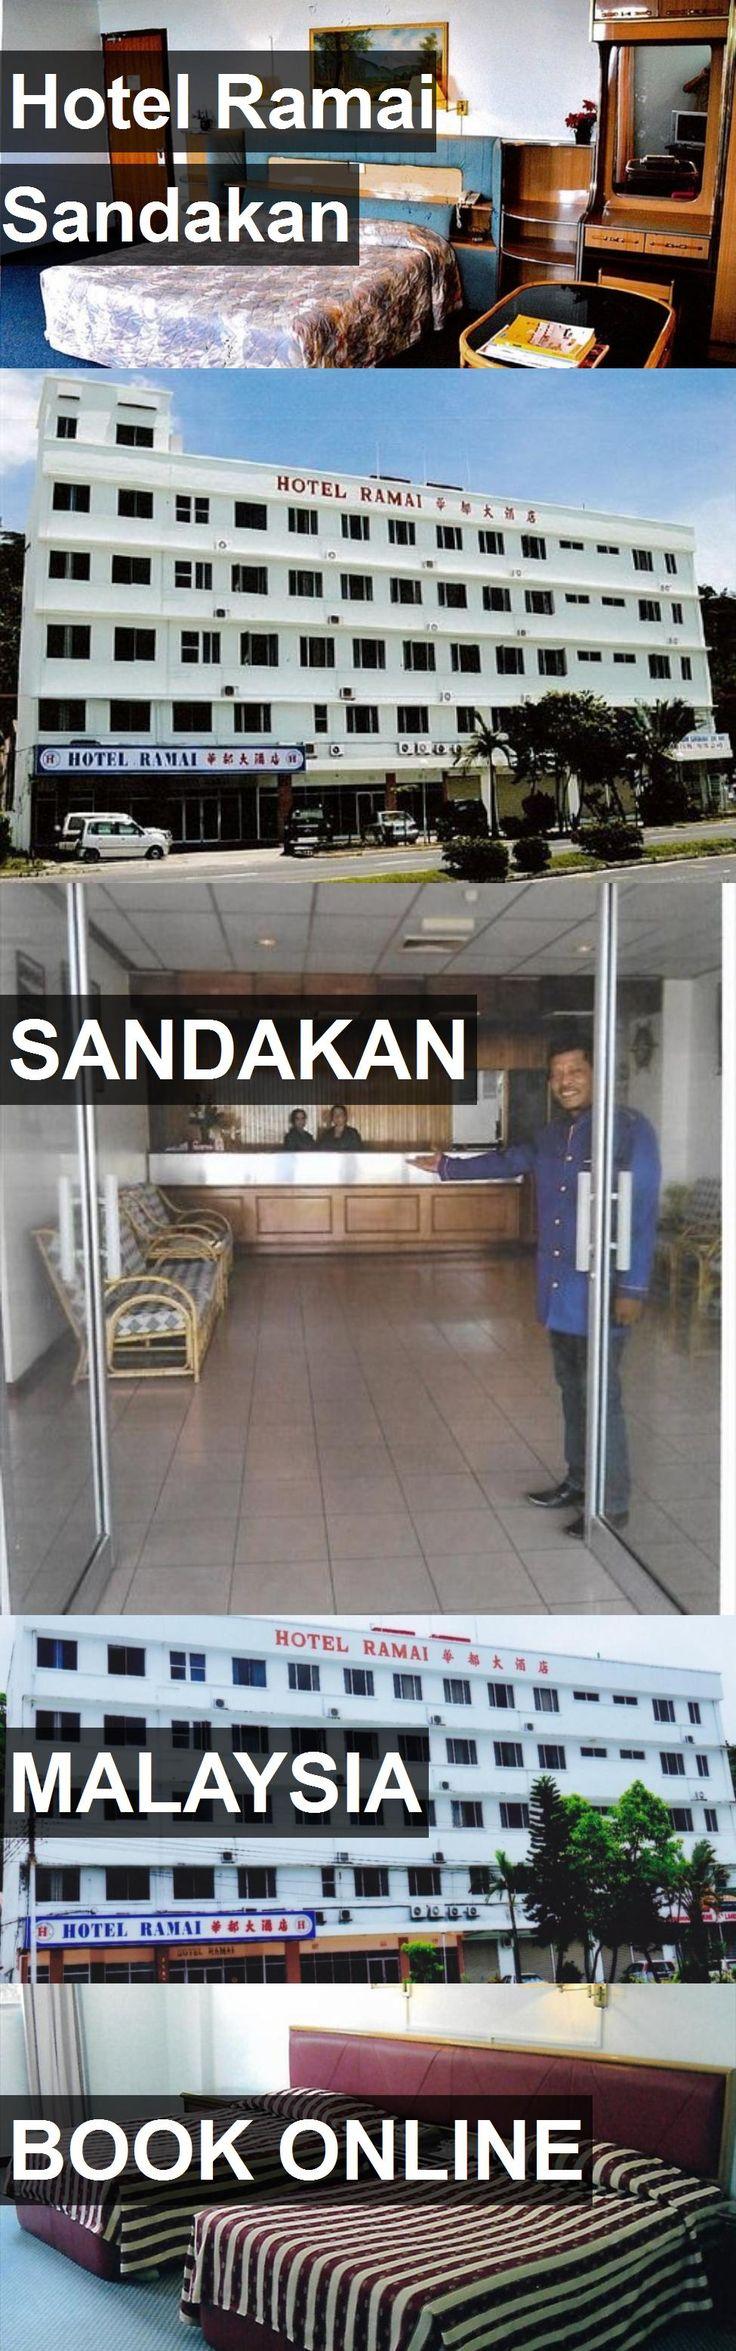 Hotel Hotel Ramai Sandakan in Sandakan, Malaysia. For more information, photos, reviews and best prices please follow the link. #Malaysia #Sandakan #HotelRamaiSandakan #hotel #travel #vacation